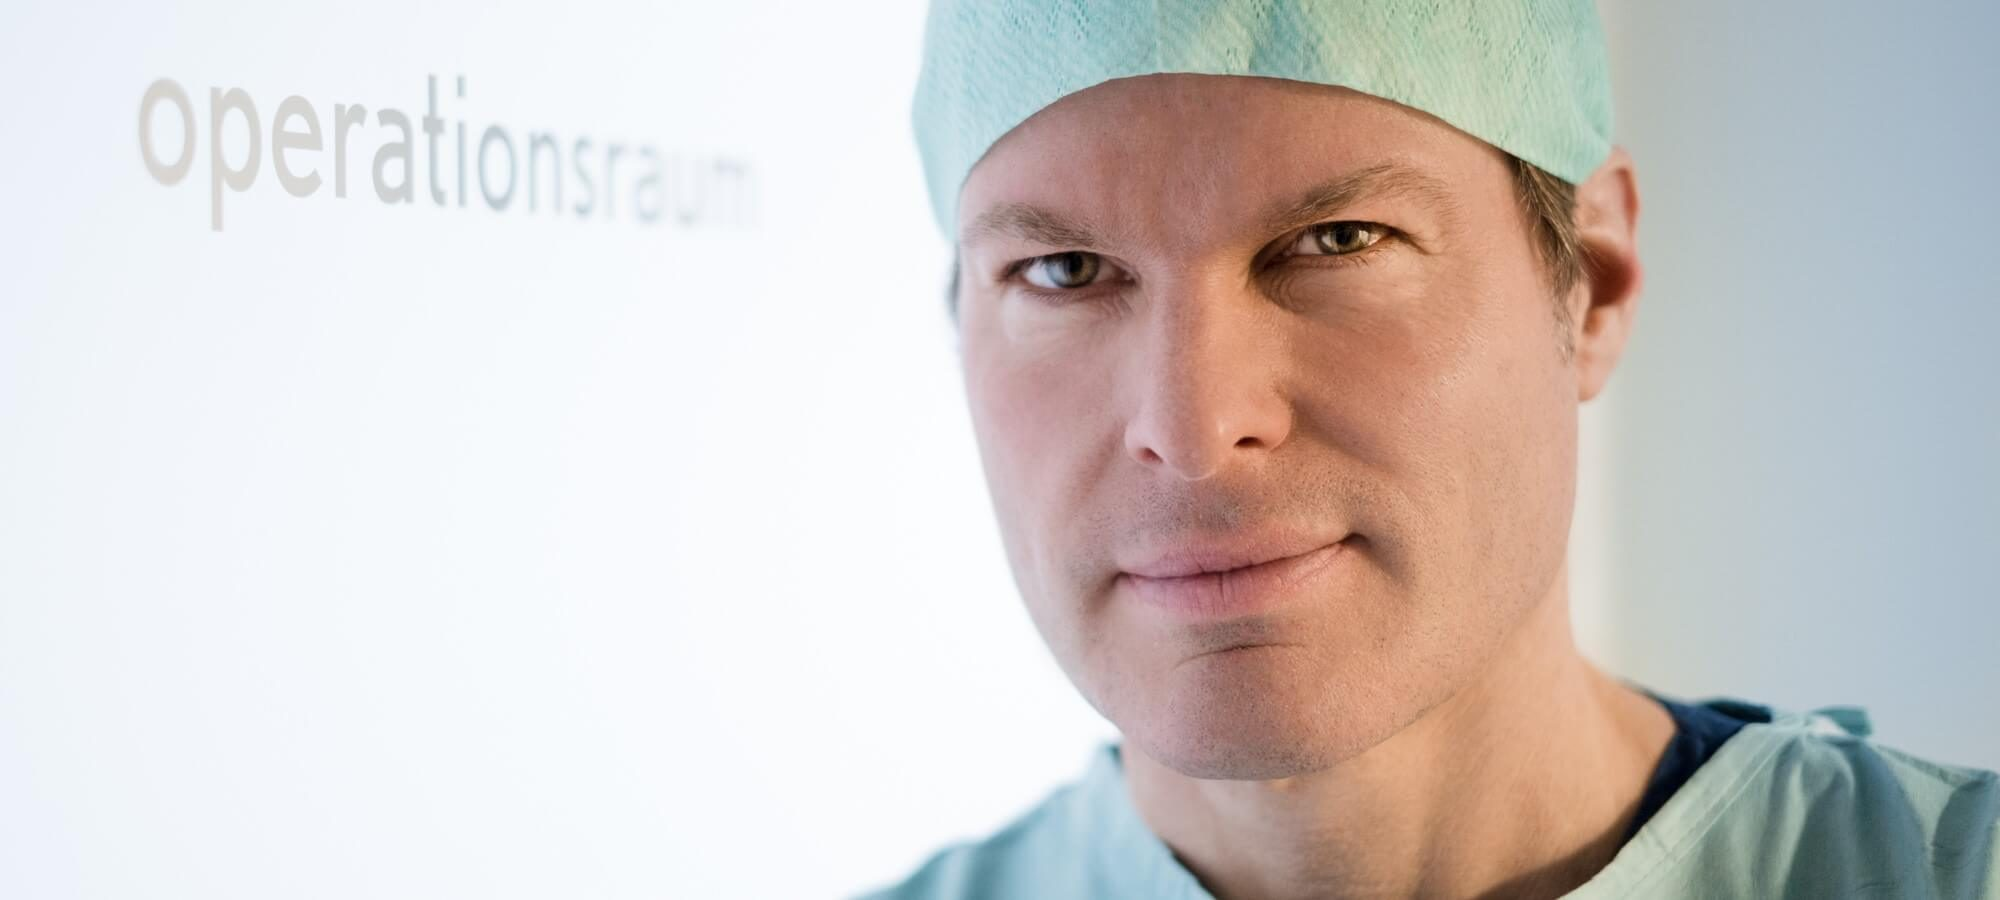 Dr. Dr. Laube Operationsraum   groisman & laube